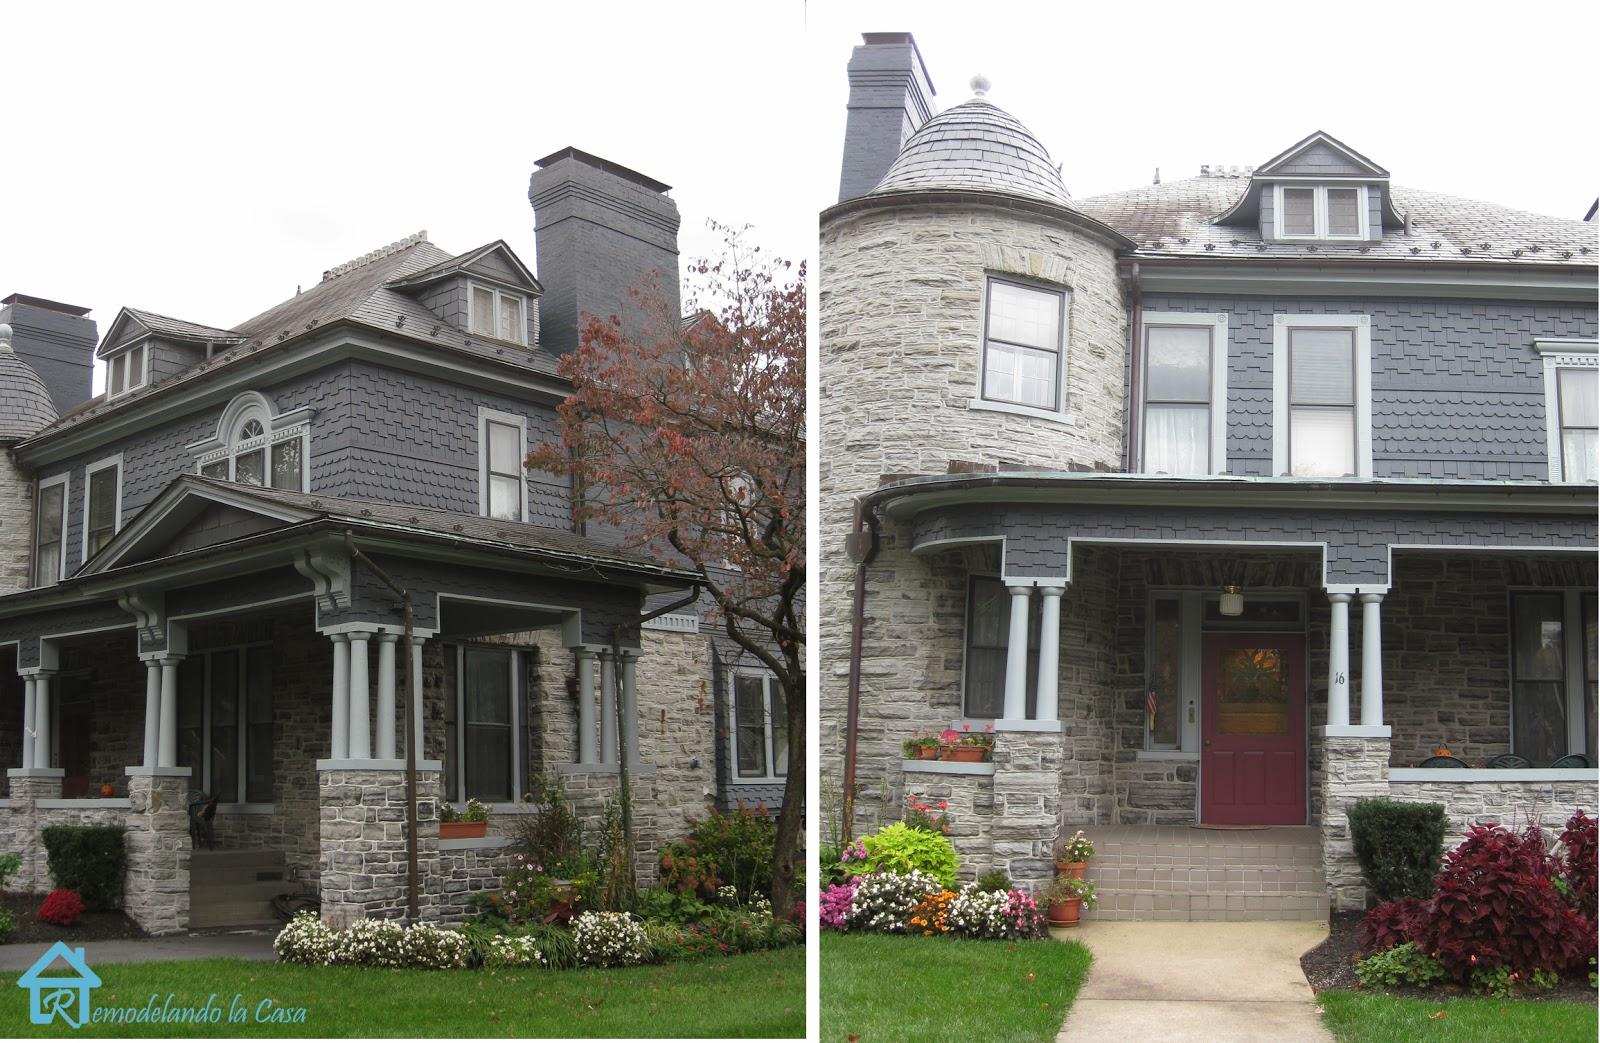 Charming victorian style row remodelando la casa for Fredrick house